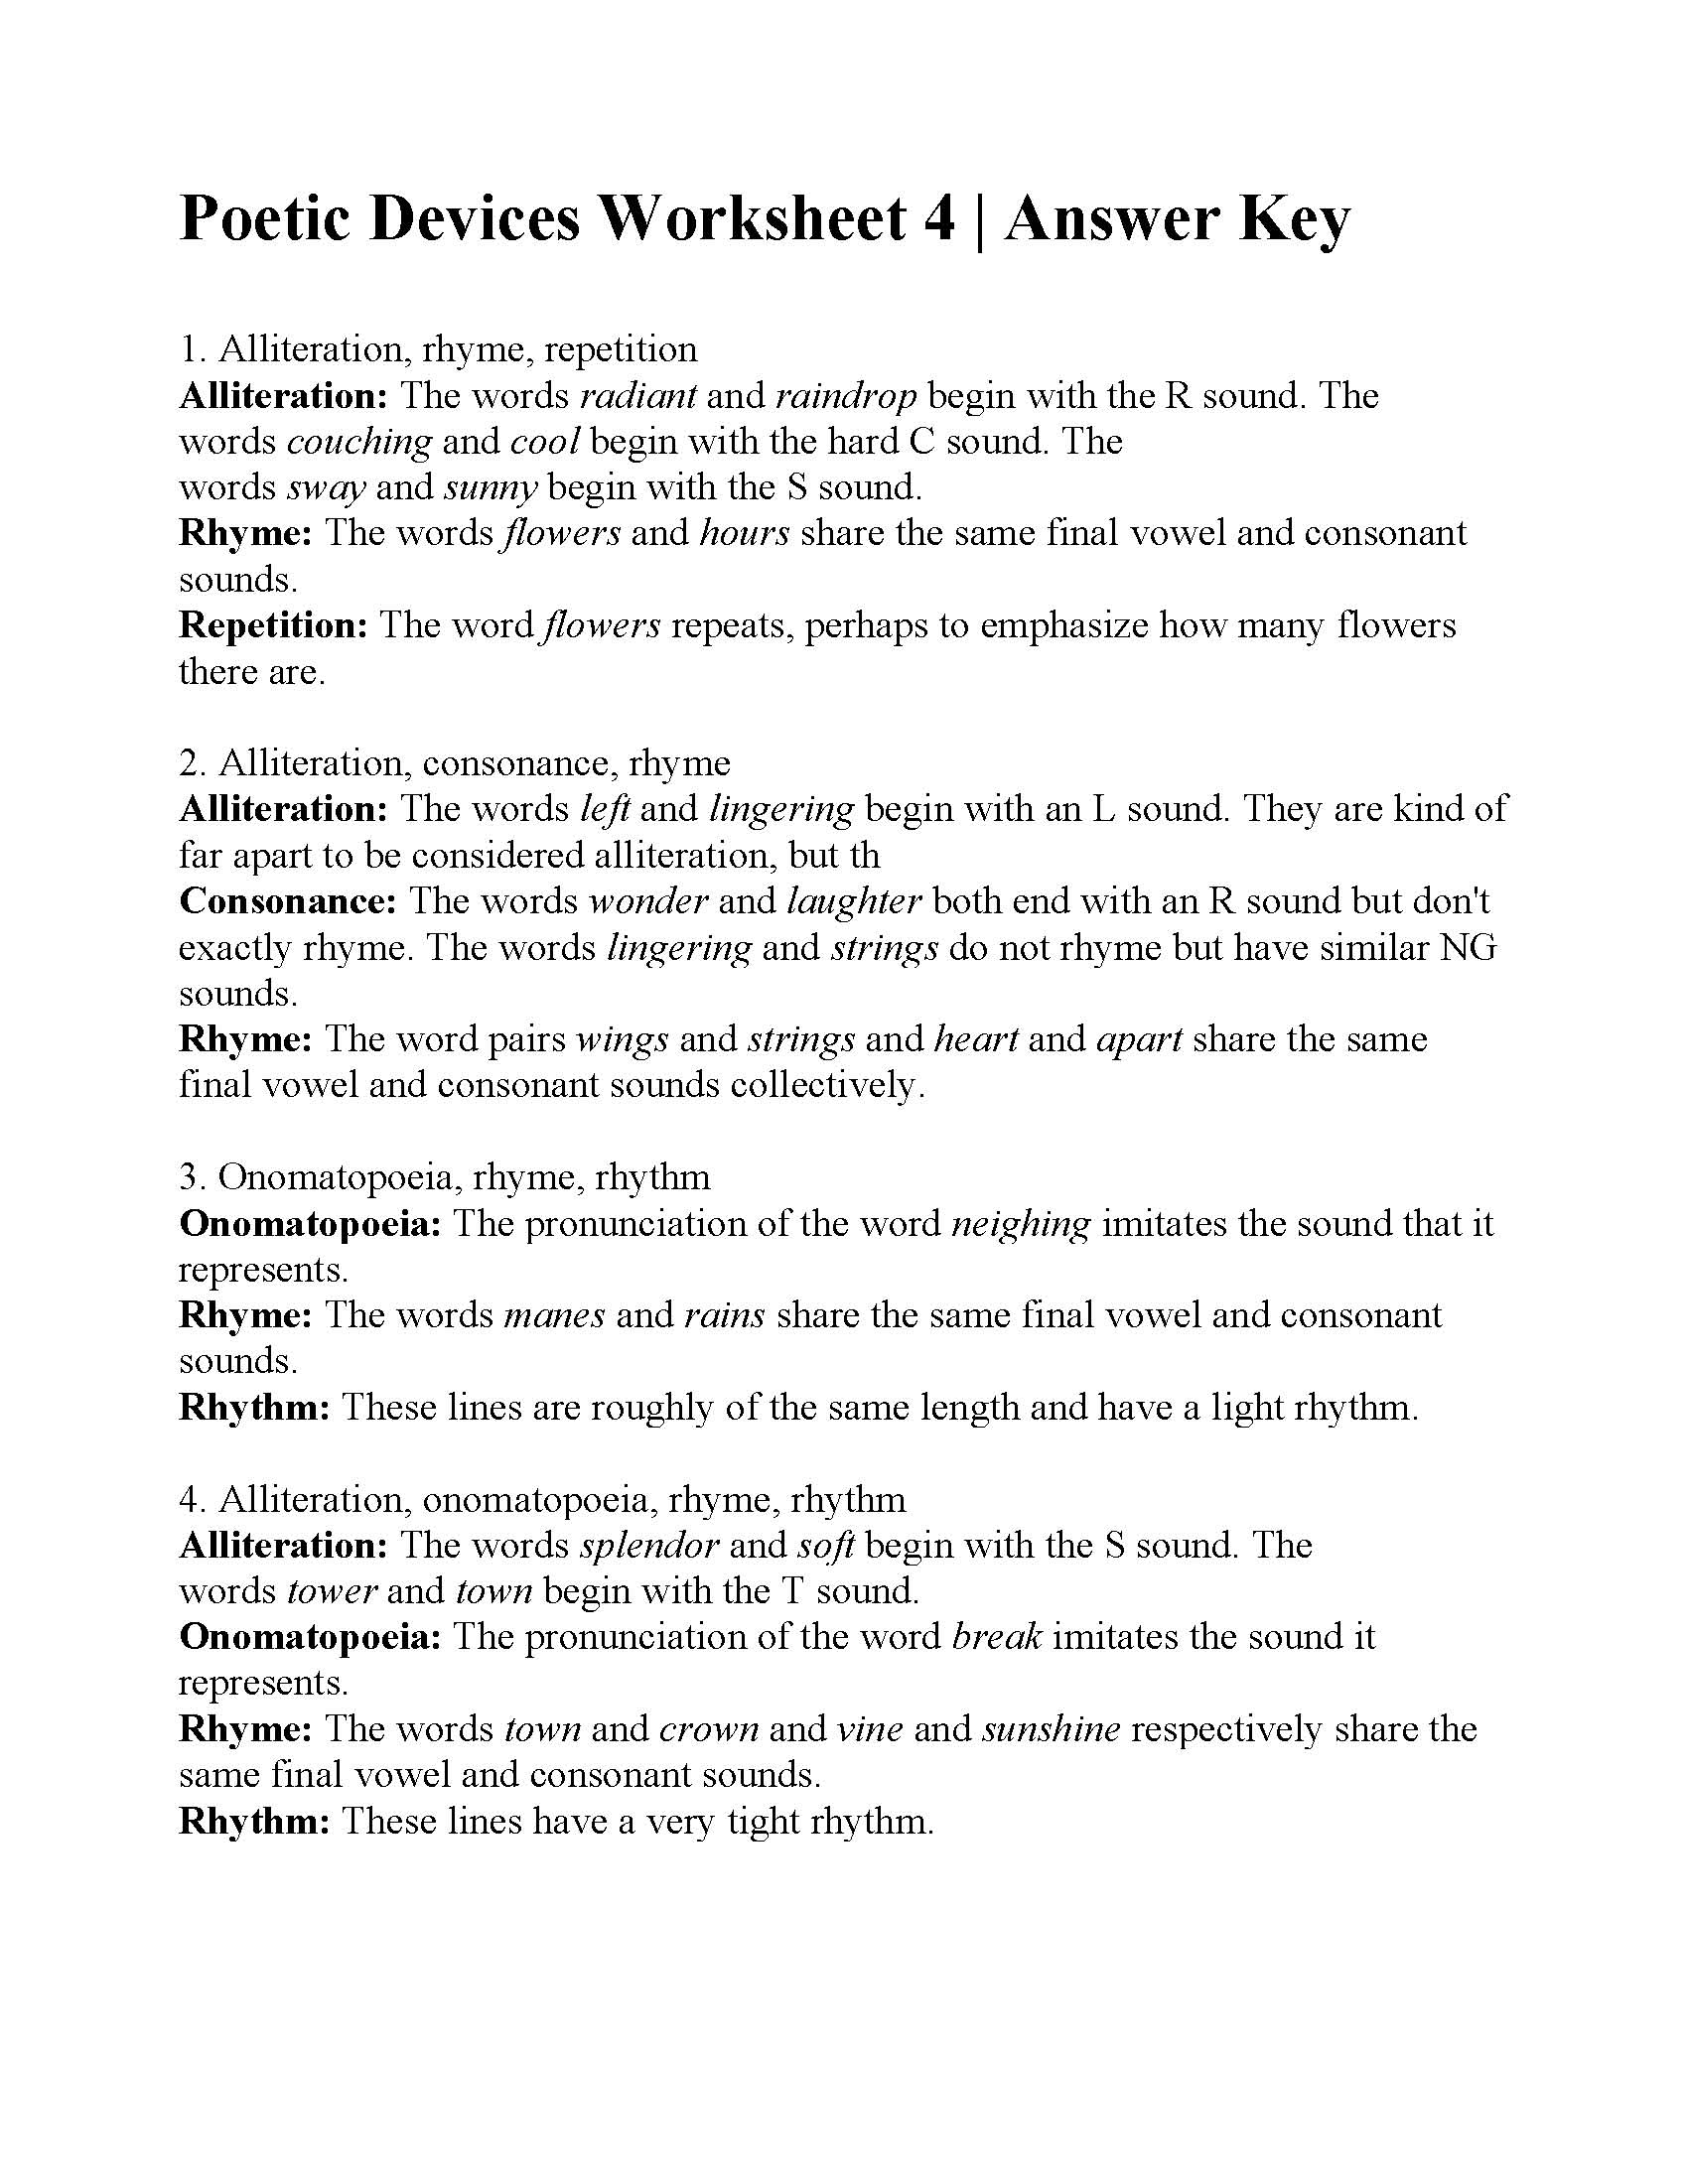 Poetic Devices Worksheet 4